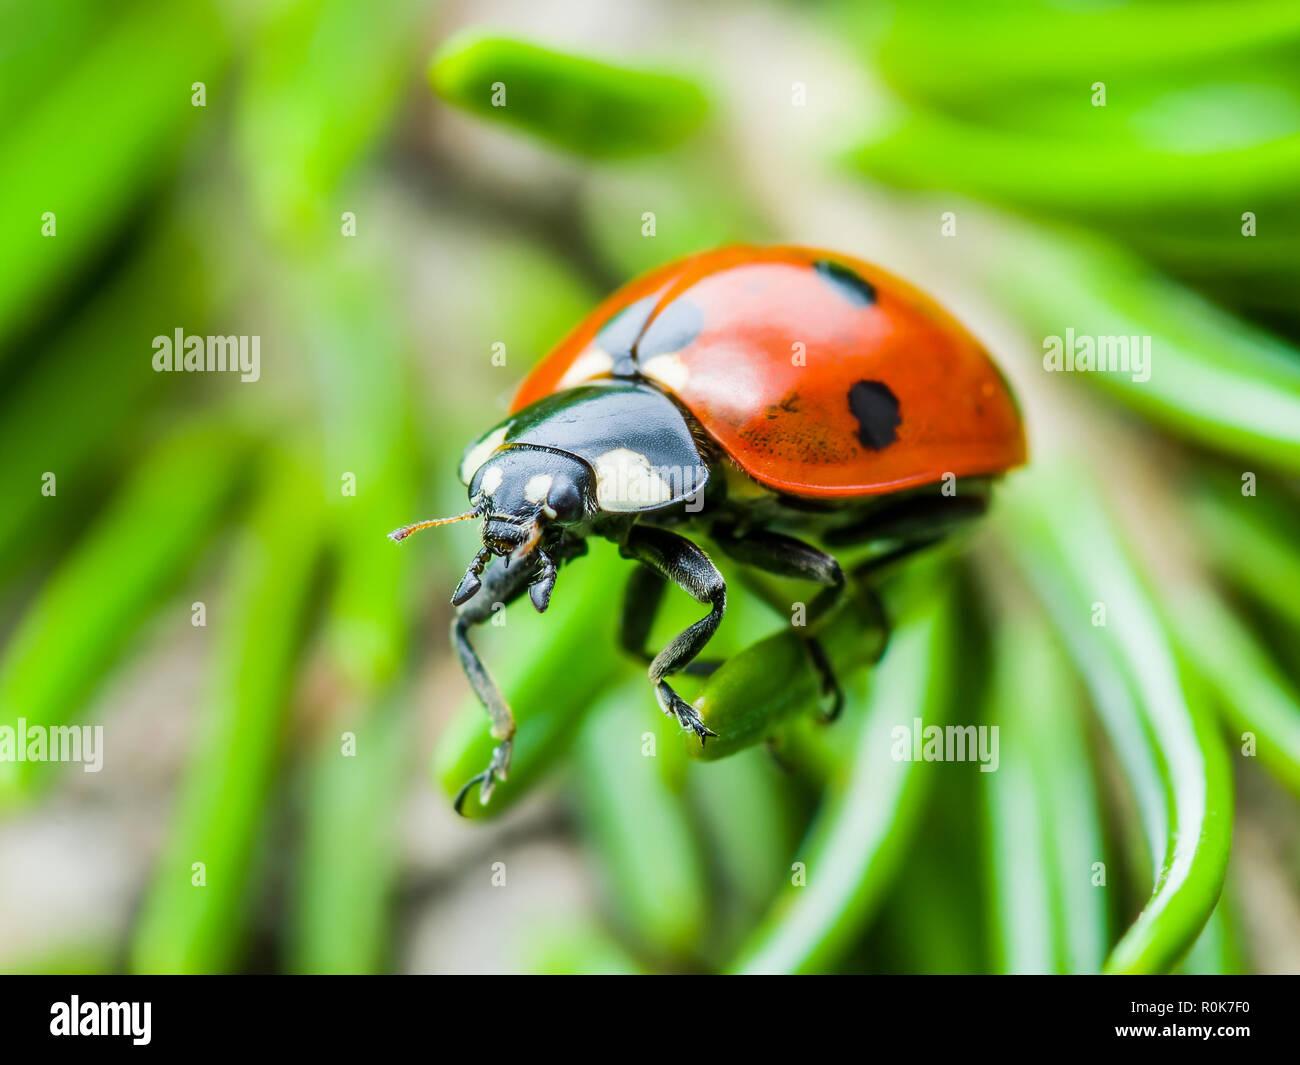 Marienkäfer Insekt kriecht auf Grüne Tanne Makro Stockbild